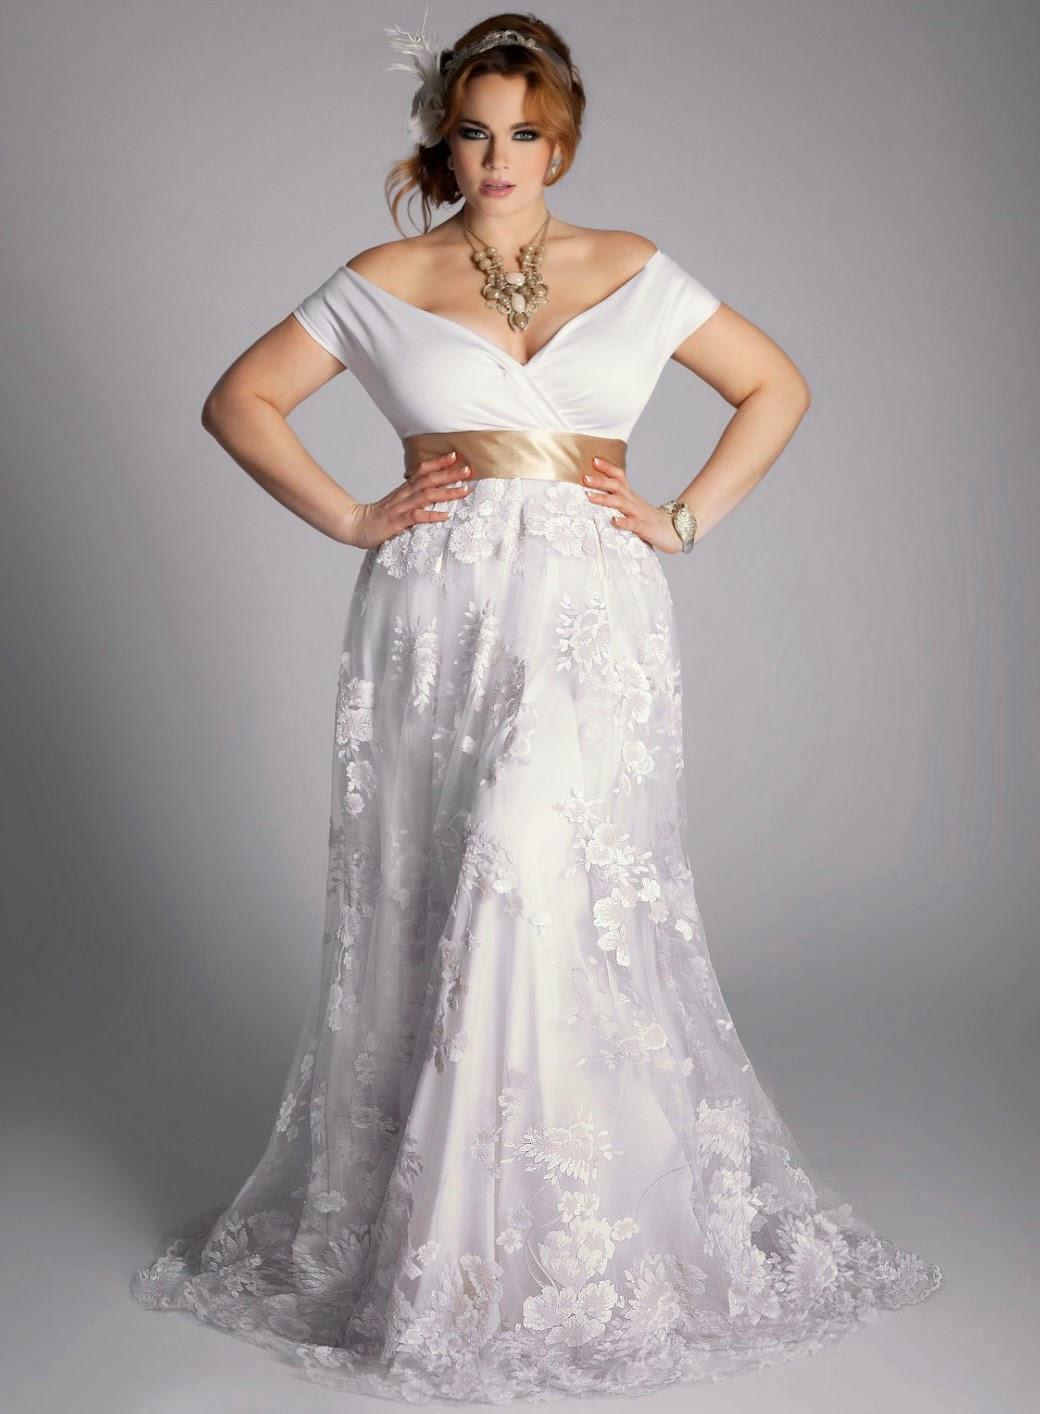 white plus size wedding dresses photo - 1